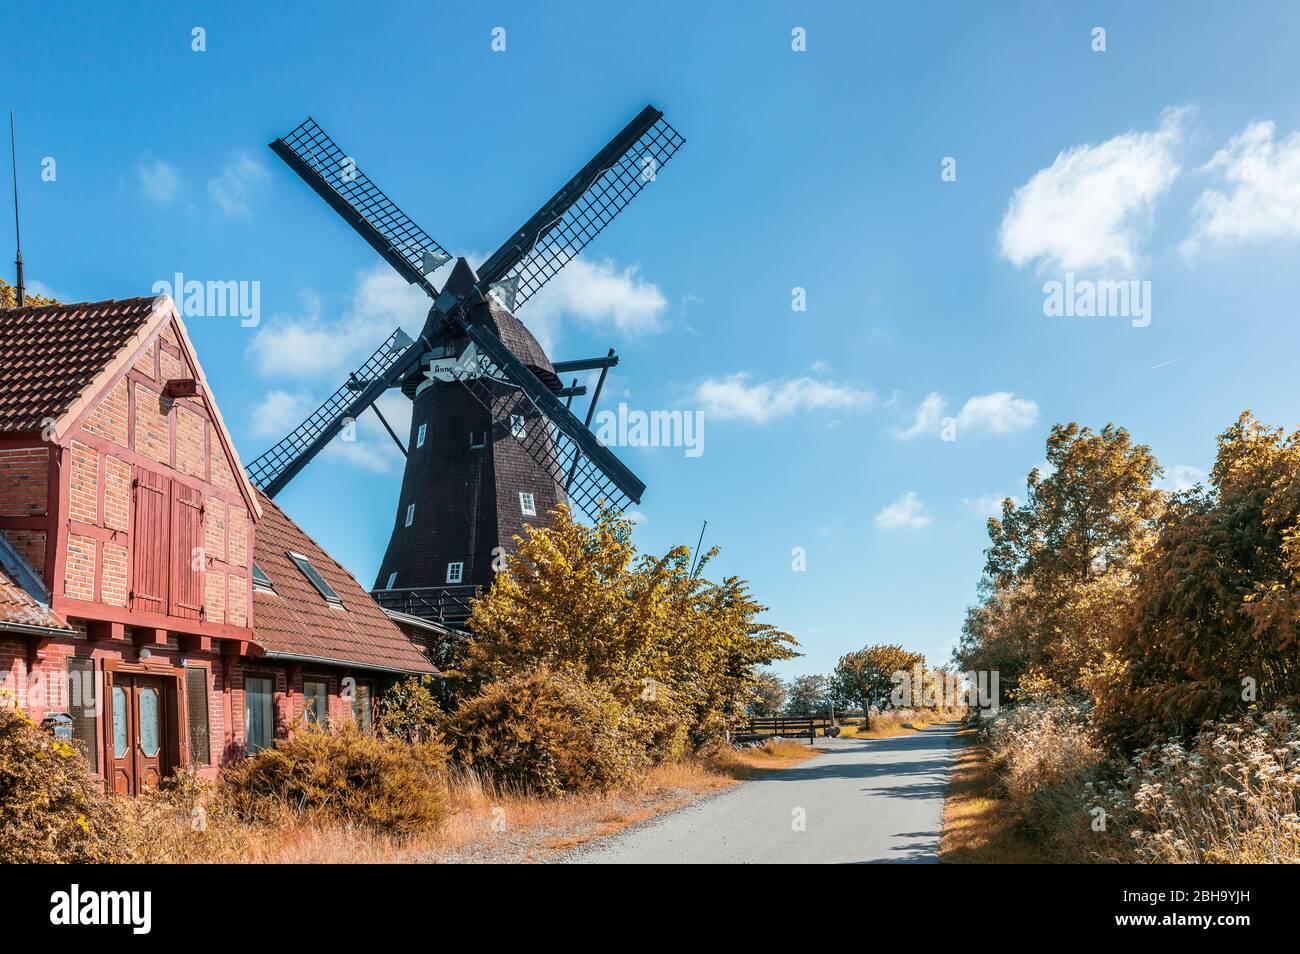 Lemkenhafen, Fehmarn, Schleswig-Holstein, Germania del Nord, mulino a vento sull'isola di Fehmarn Foto Stock